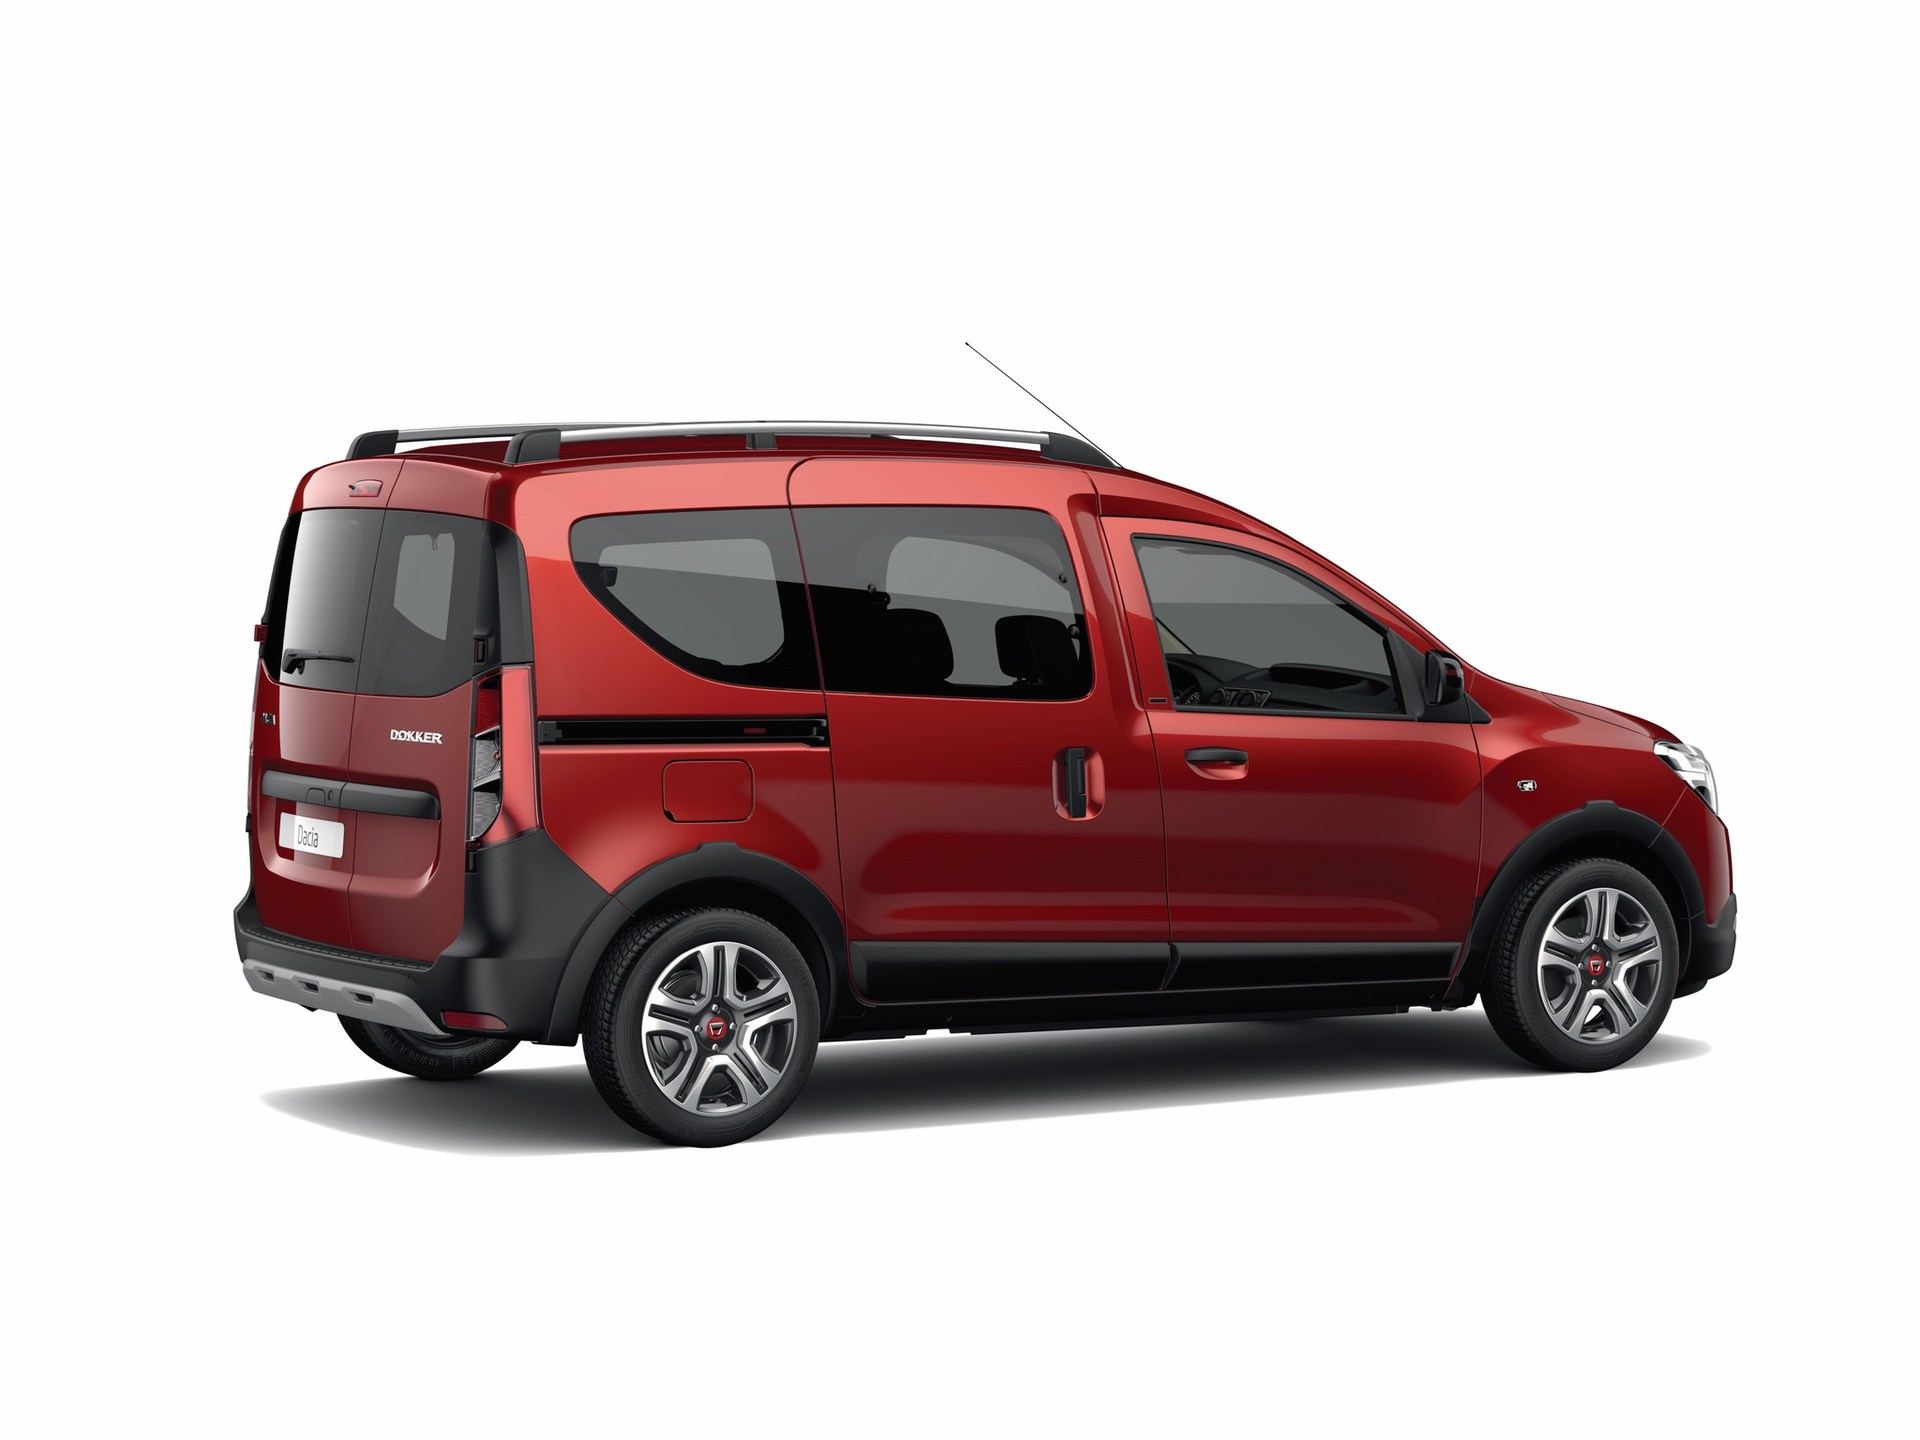 2019 - Dacia DOKKER STEPWAY Série Limitée Ultimate (ou Techroad)